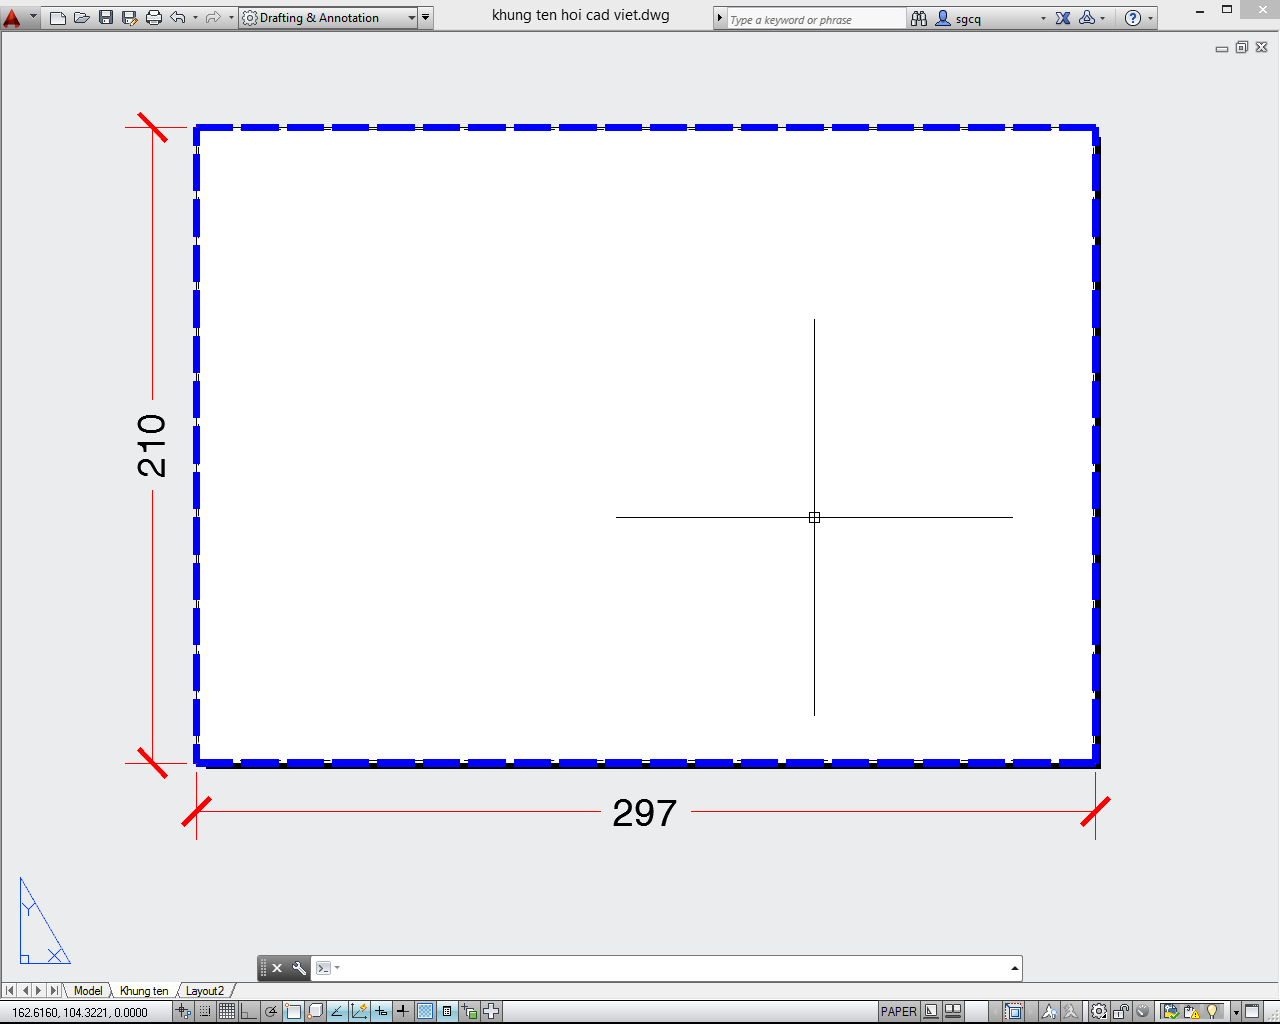 110802_screenshot_83.png